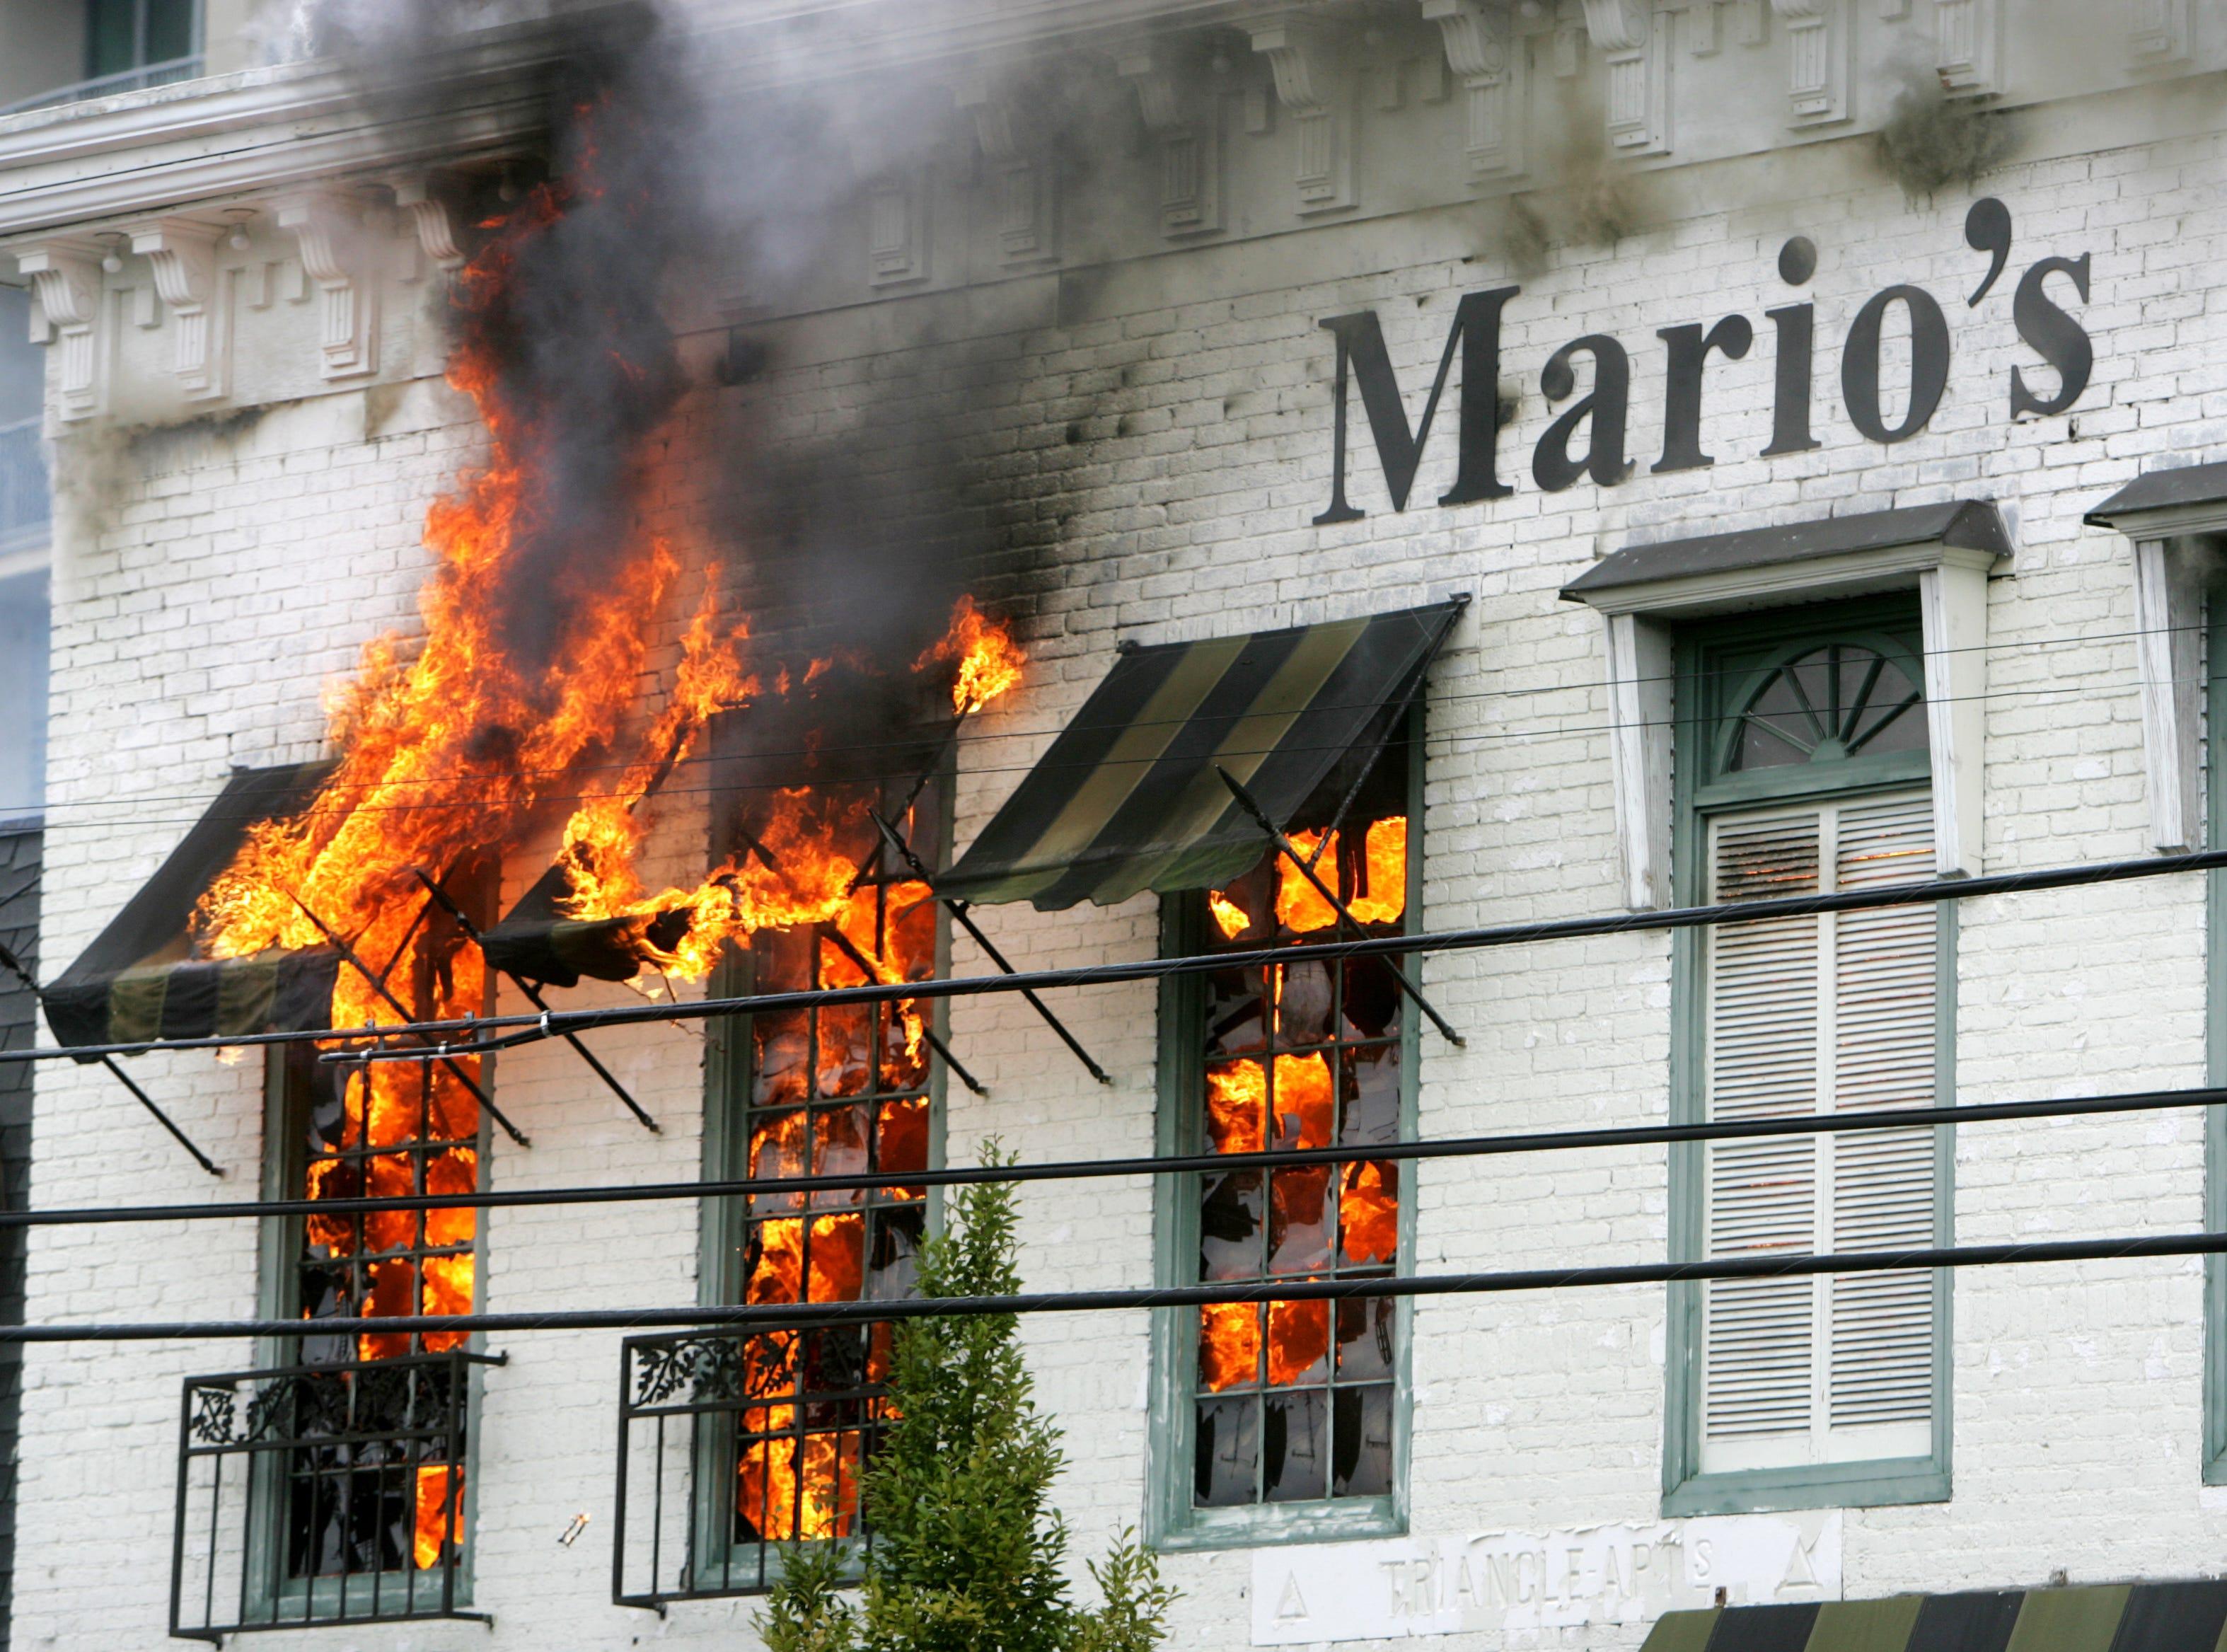 Fire comes through the windows at Mario's restaurant in Nashville Sept. 16, 2008.